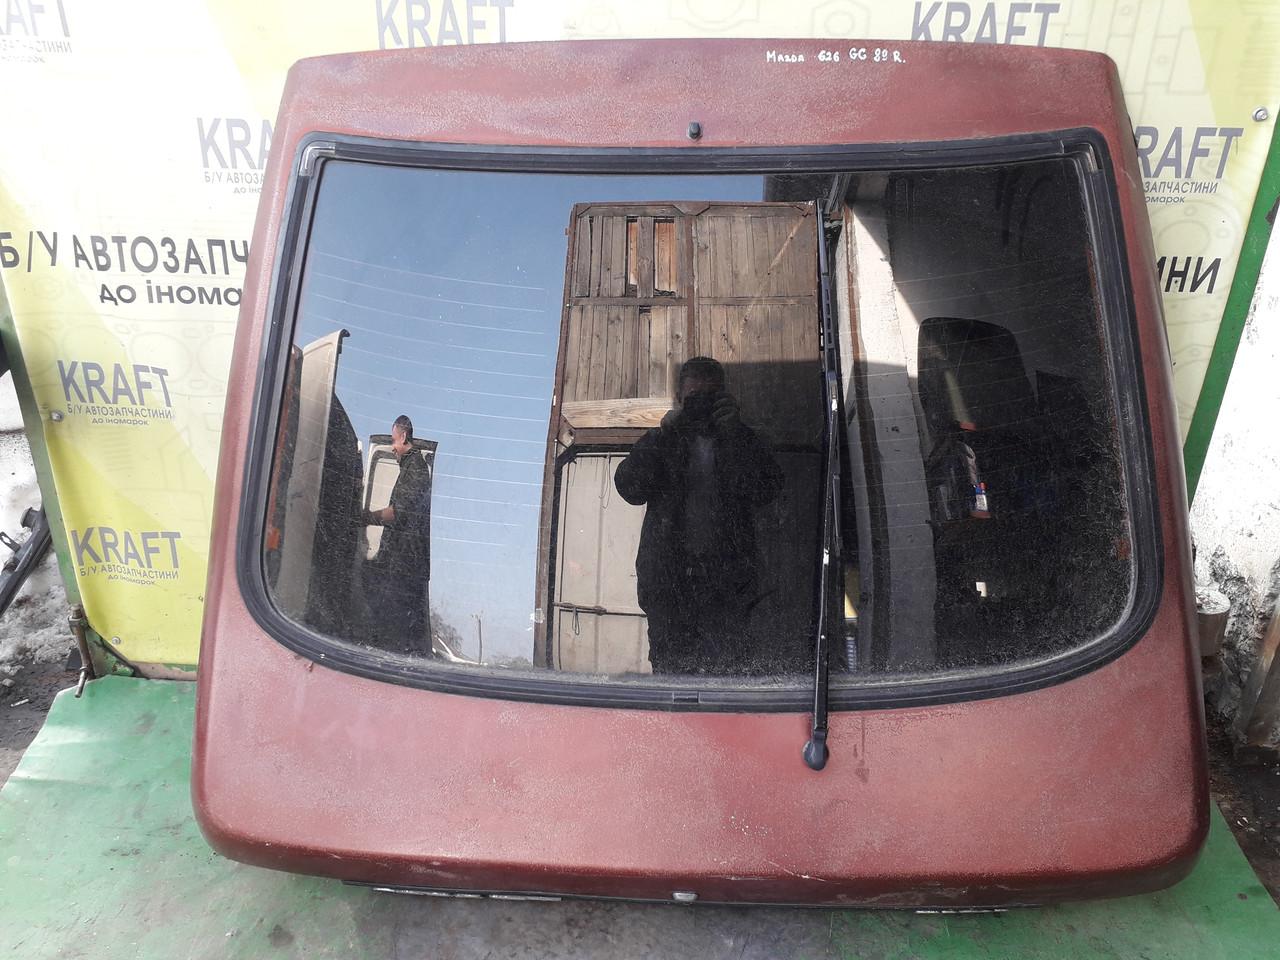 Бу крышка багажника для Mazda 626 GC 1988 p.